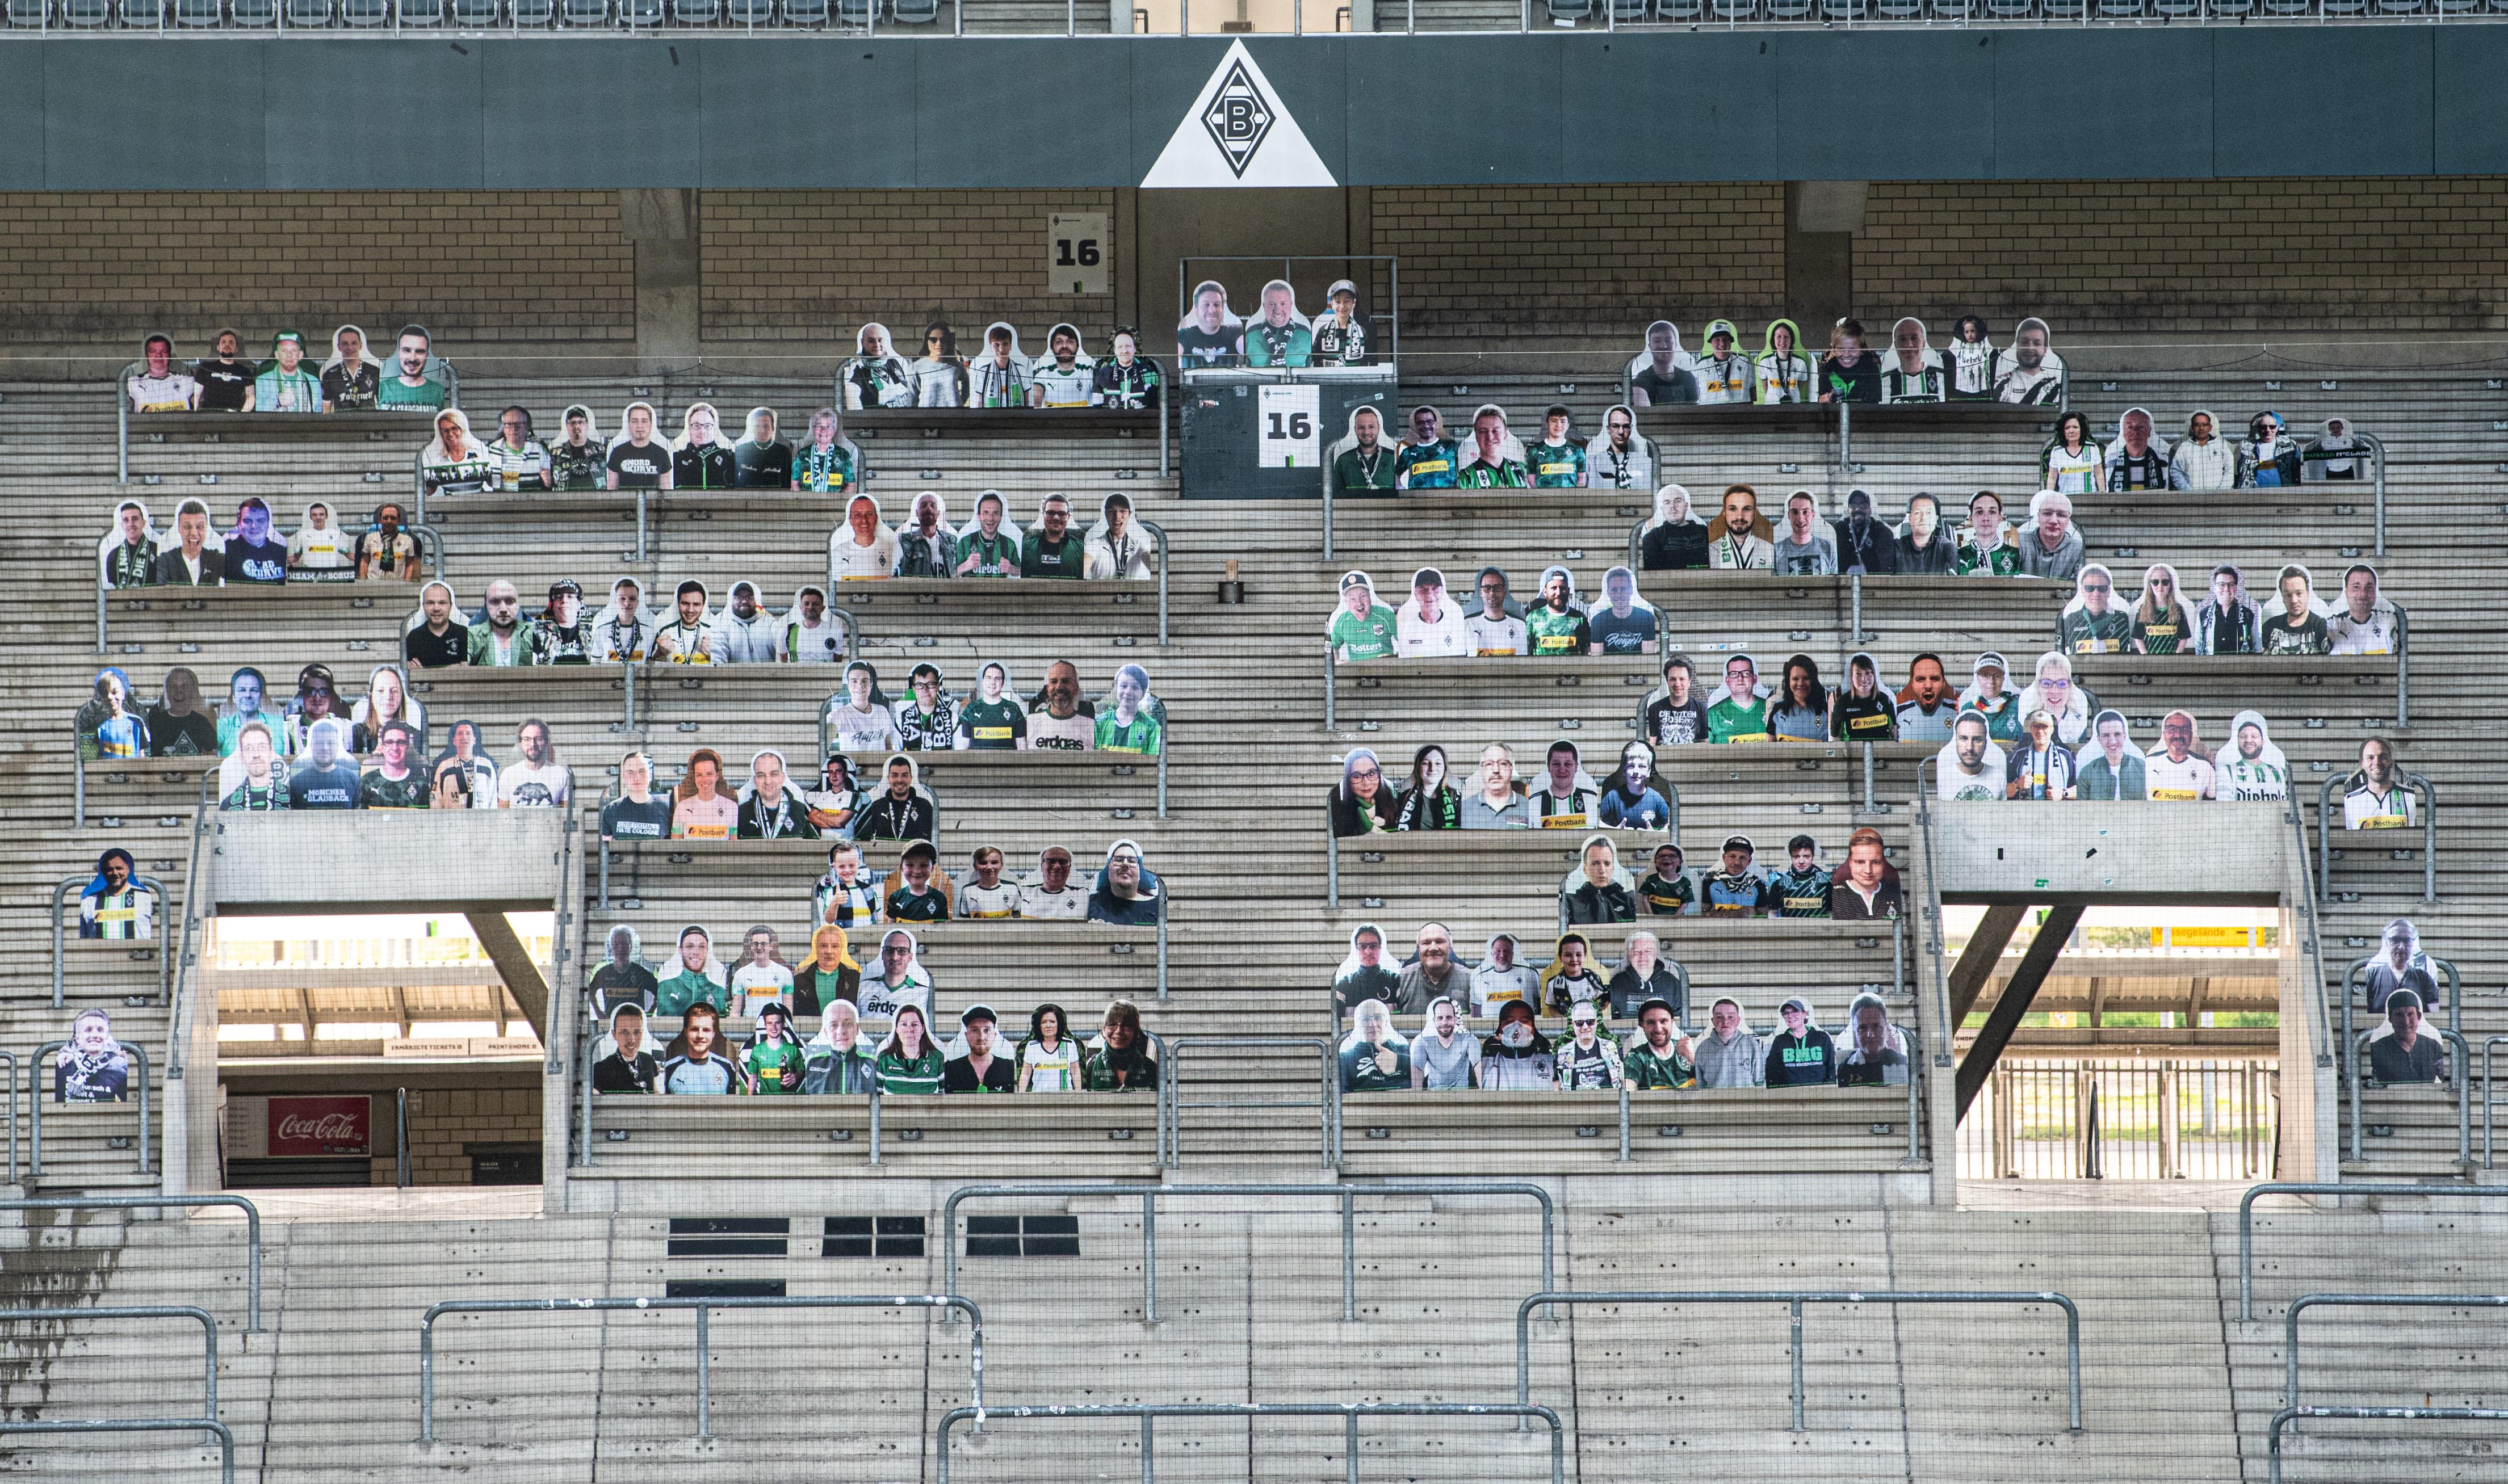 GettyImages fani fotbal borussia stadion germania pandemie